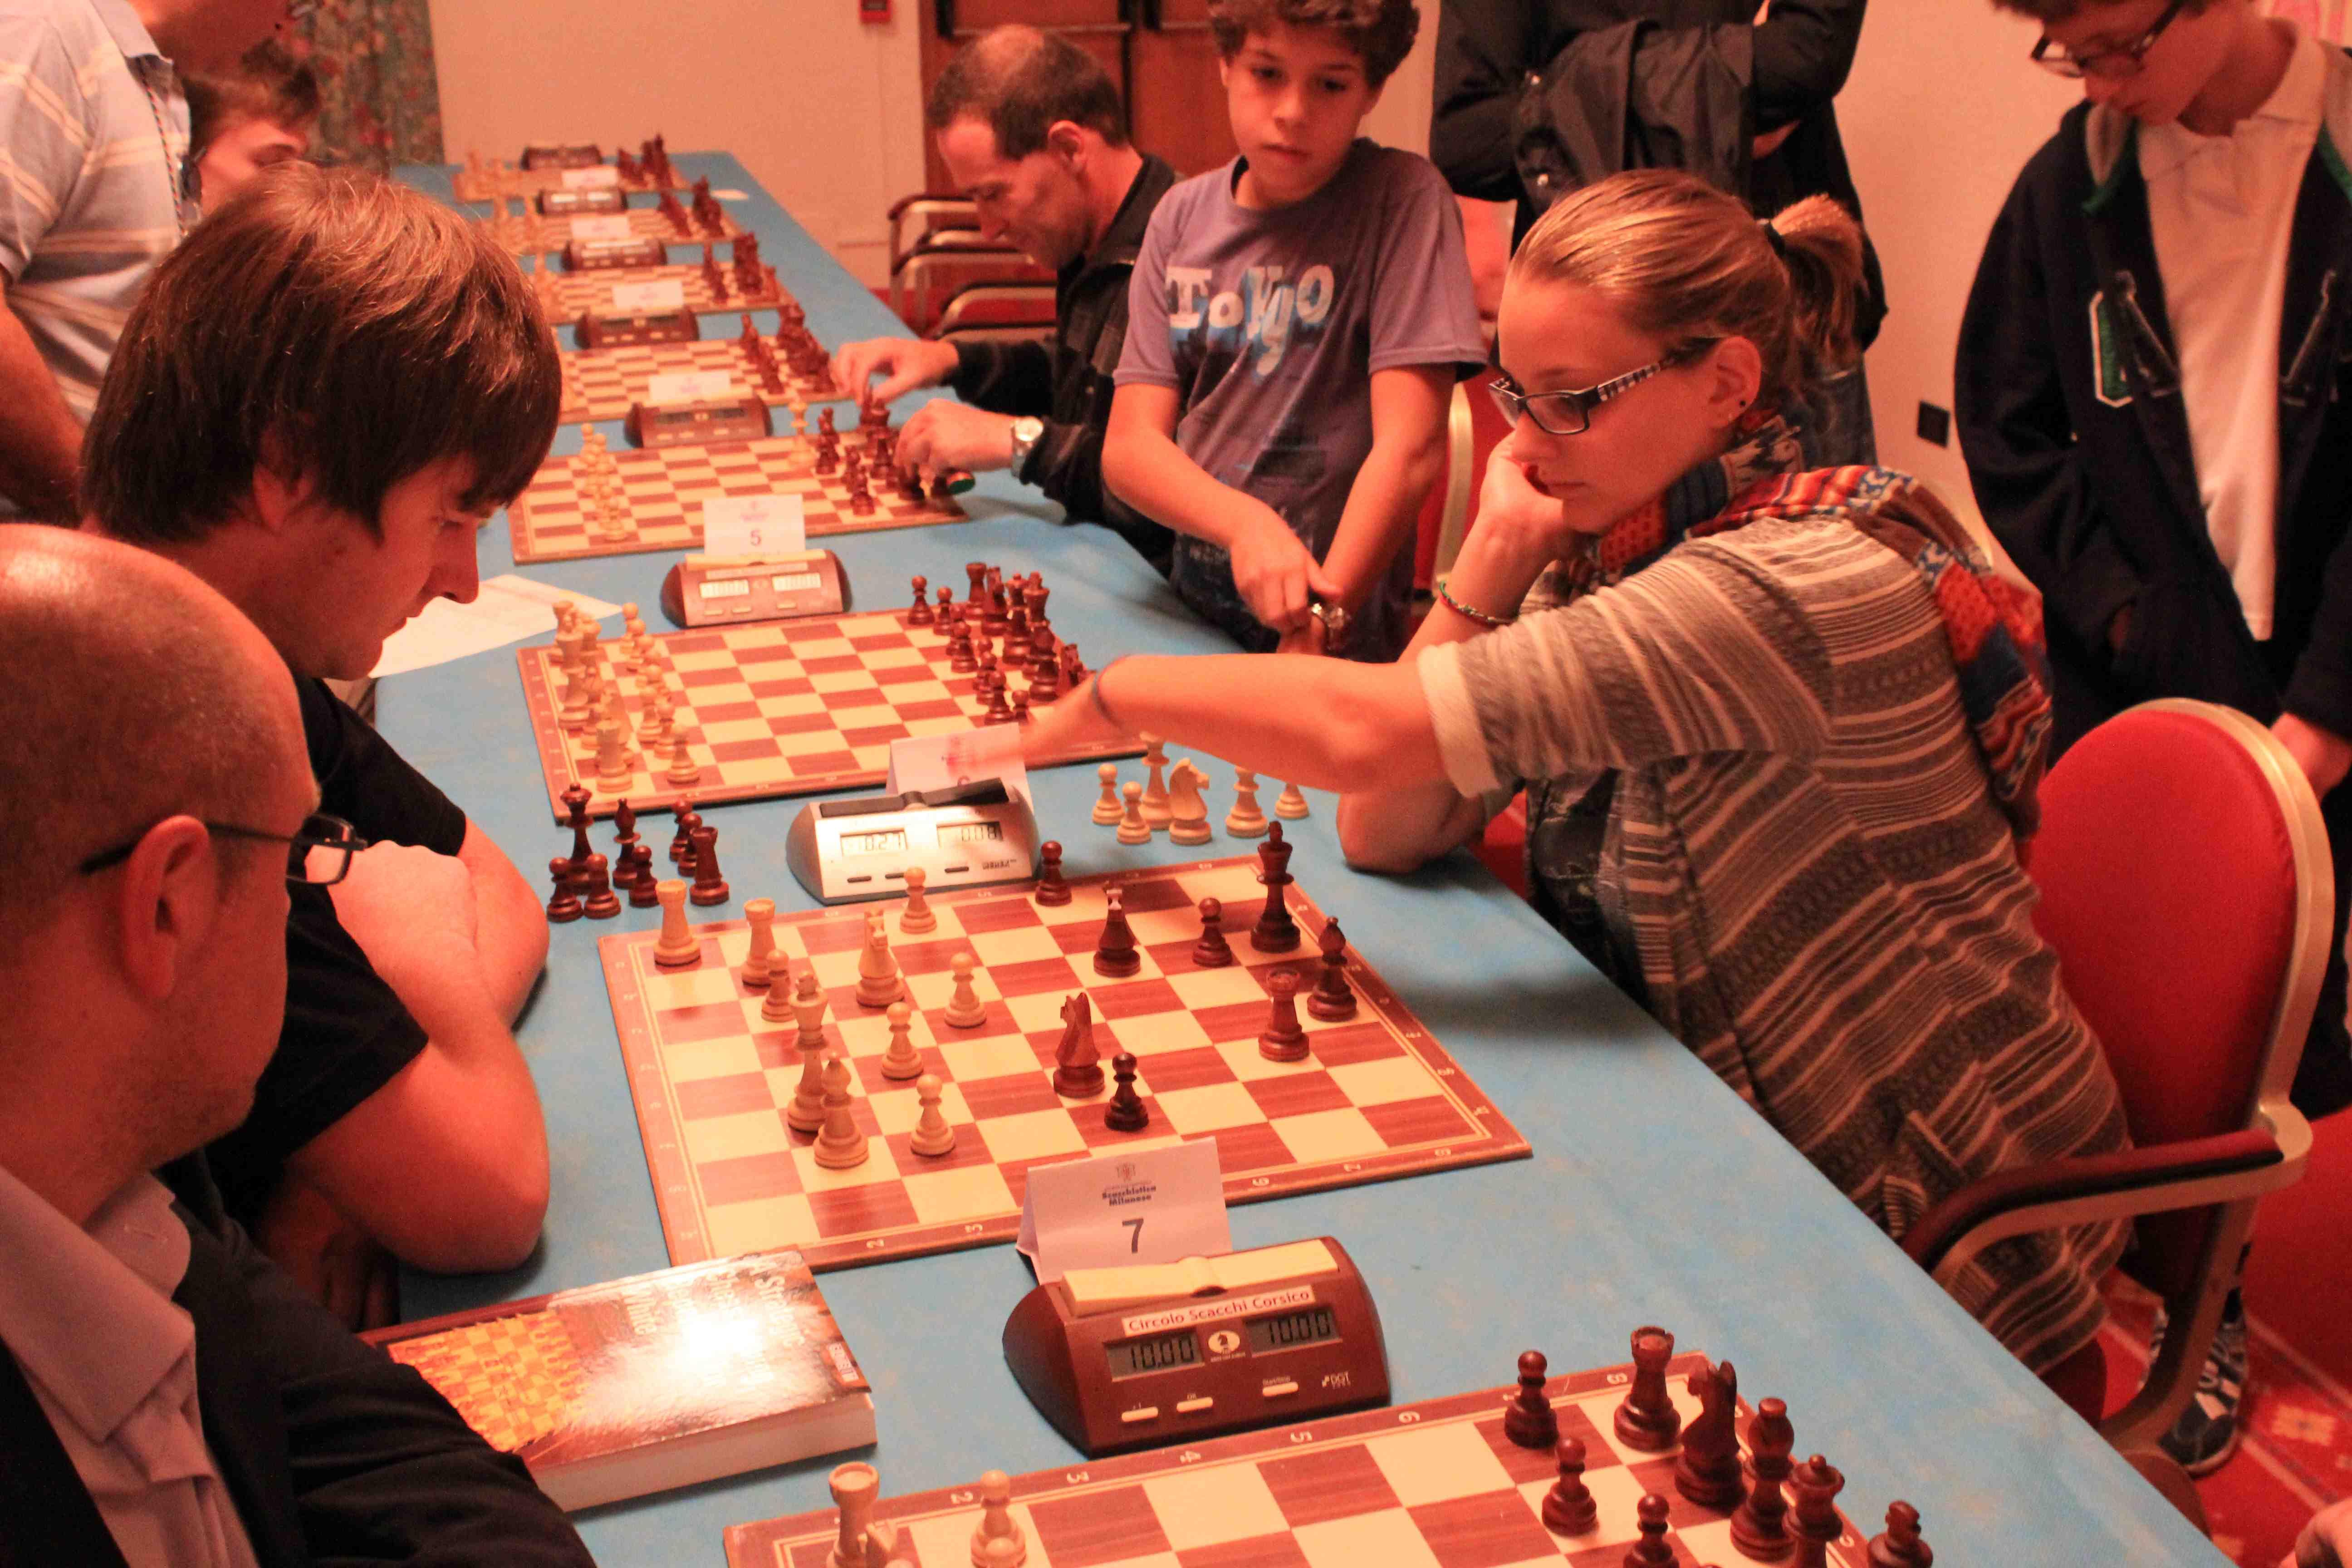 Torneo di Scacchi960; Silvia Caldi in azione. Foto di Volfango Rizzi (SPQeR).